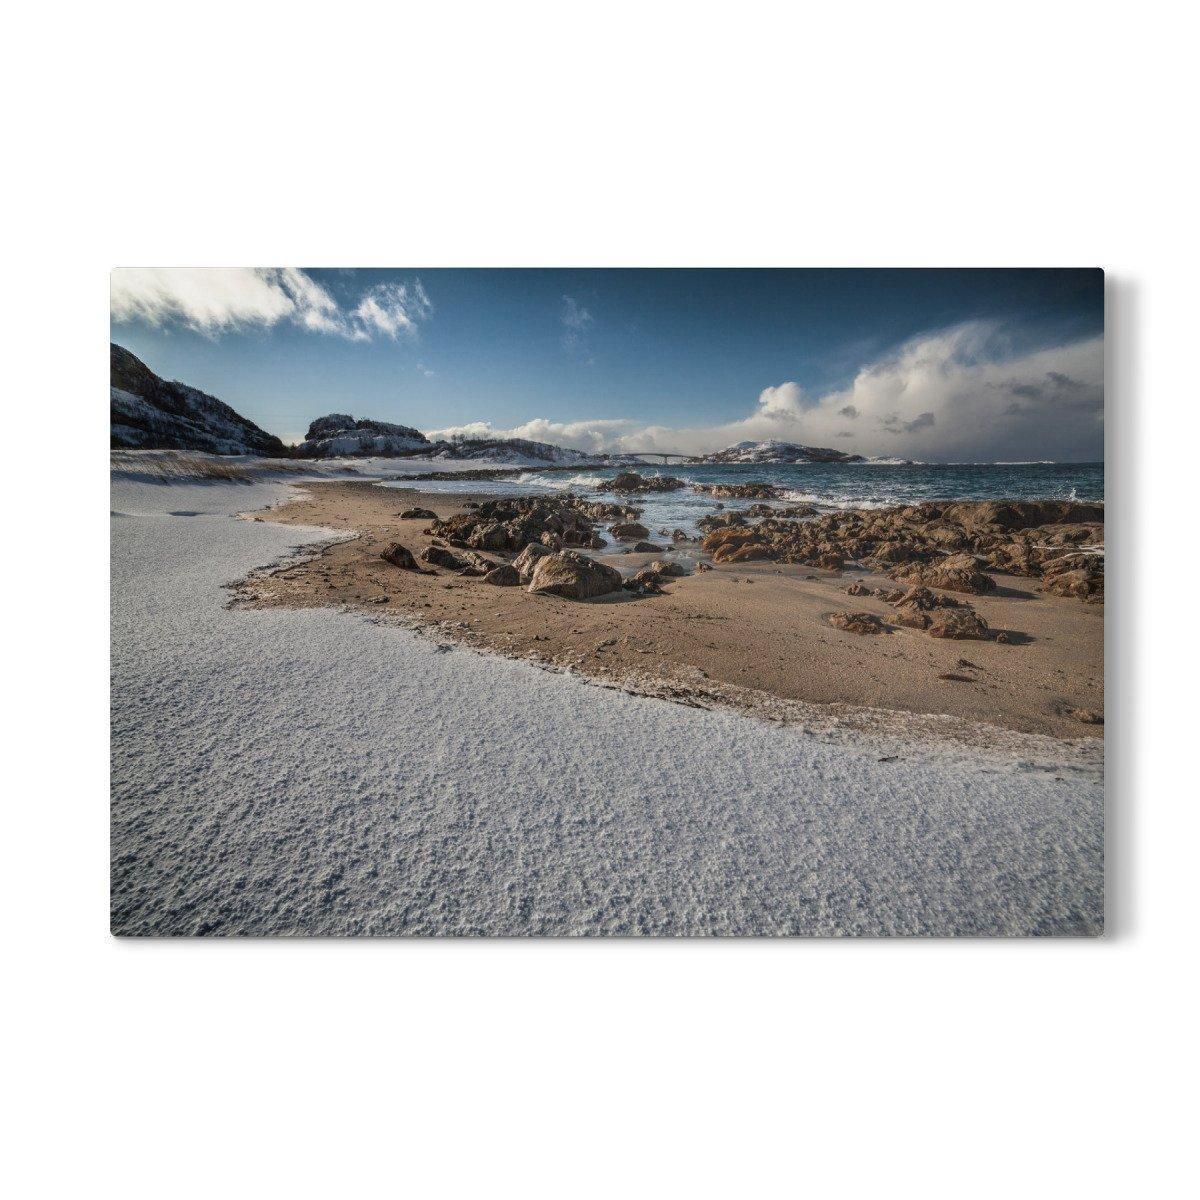 artboxONE Galerie-Print 60x40 cm Schneestrand hochwertiges Acrylglas auf Alu-Dibond Bild - Wandbild von Sebastian Worm